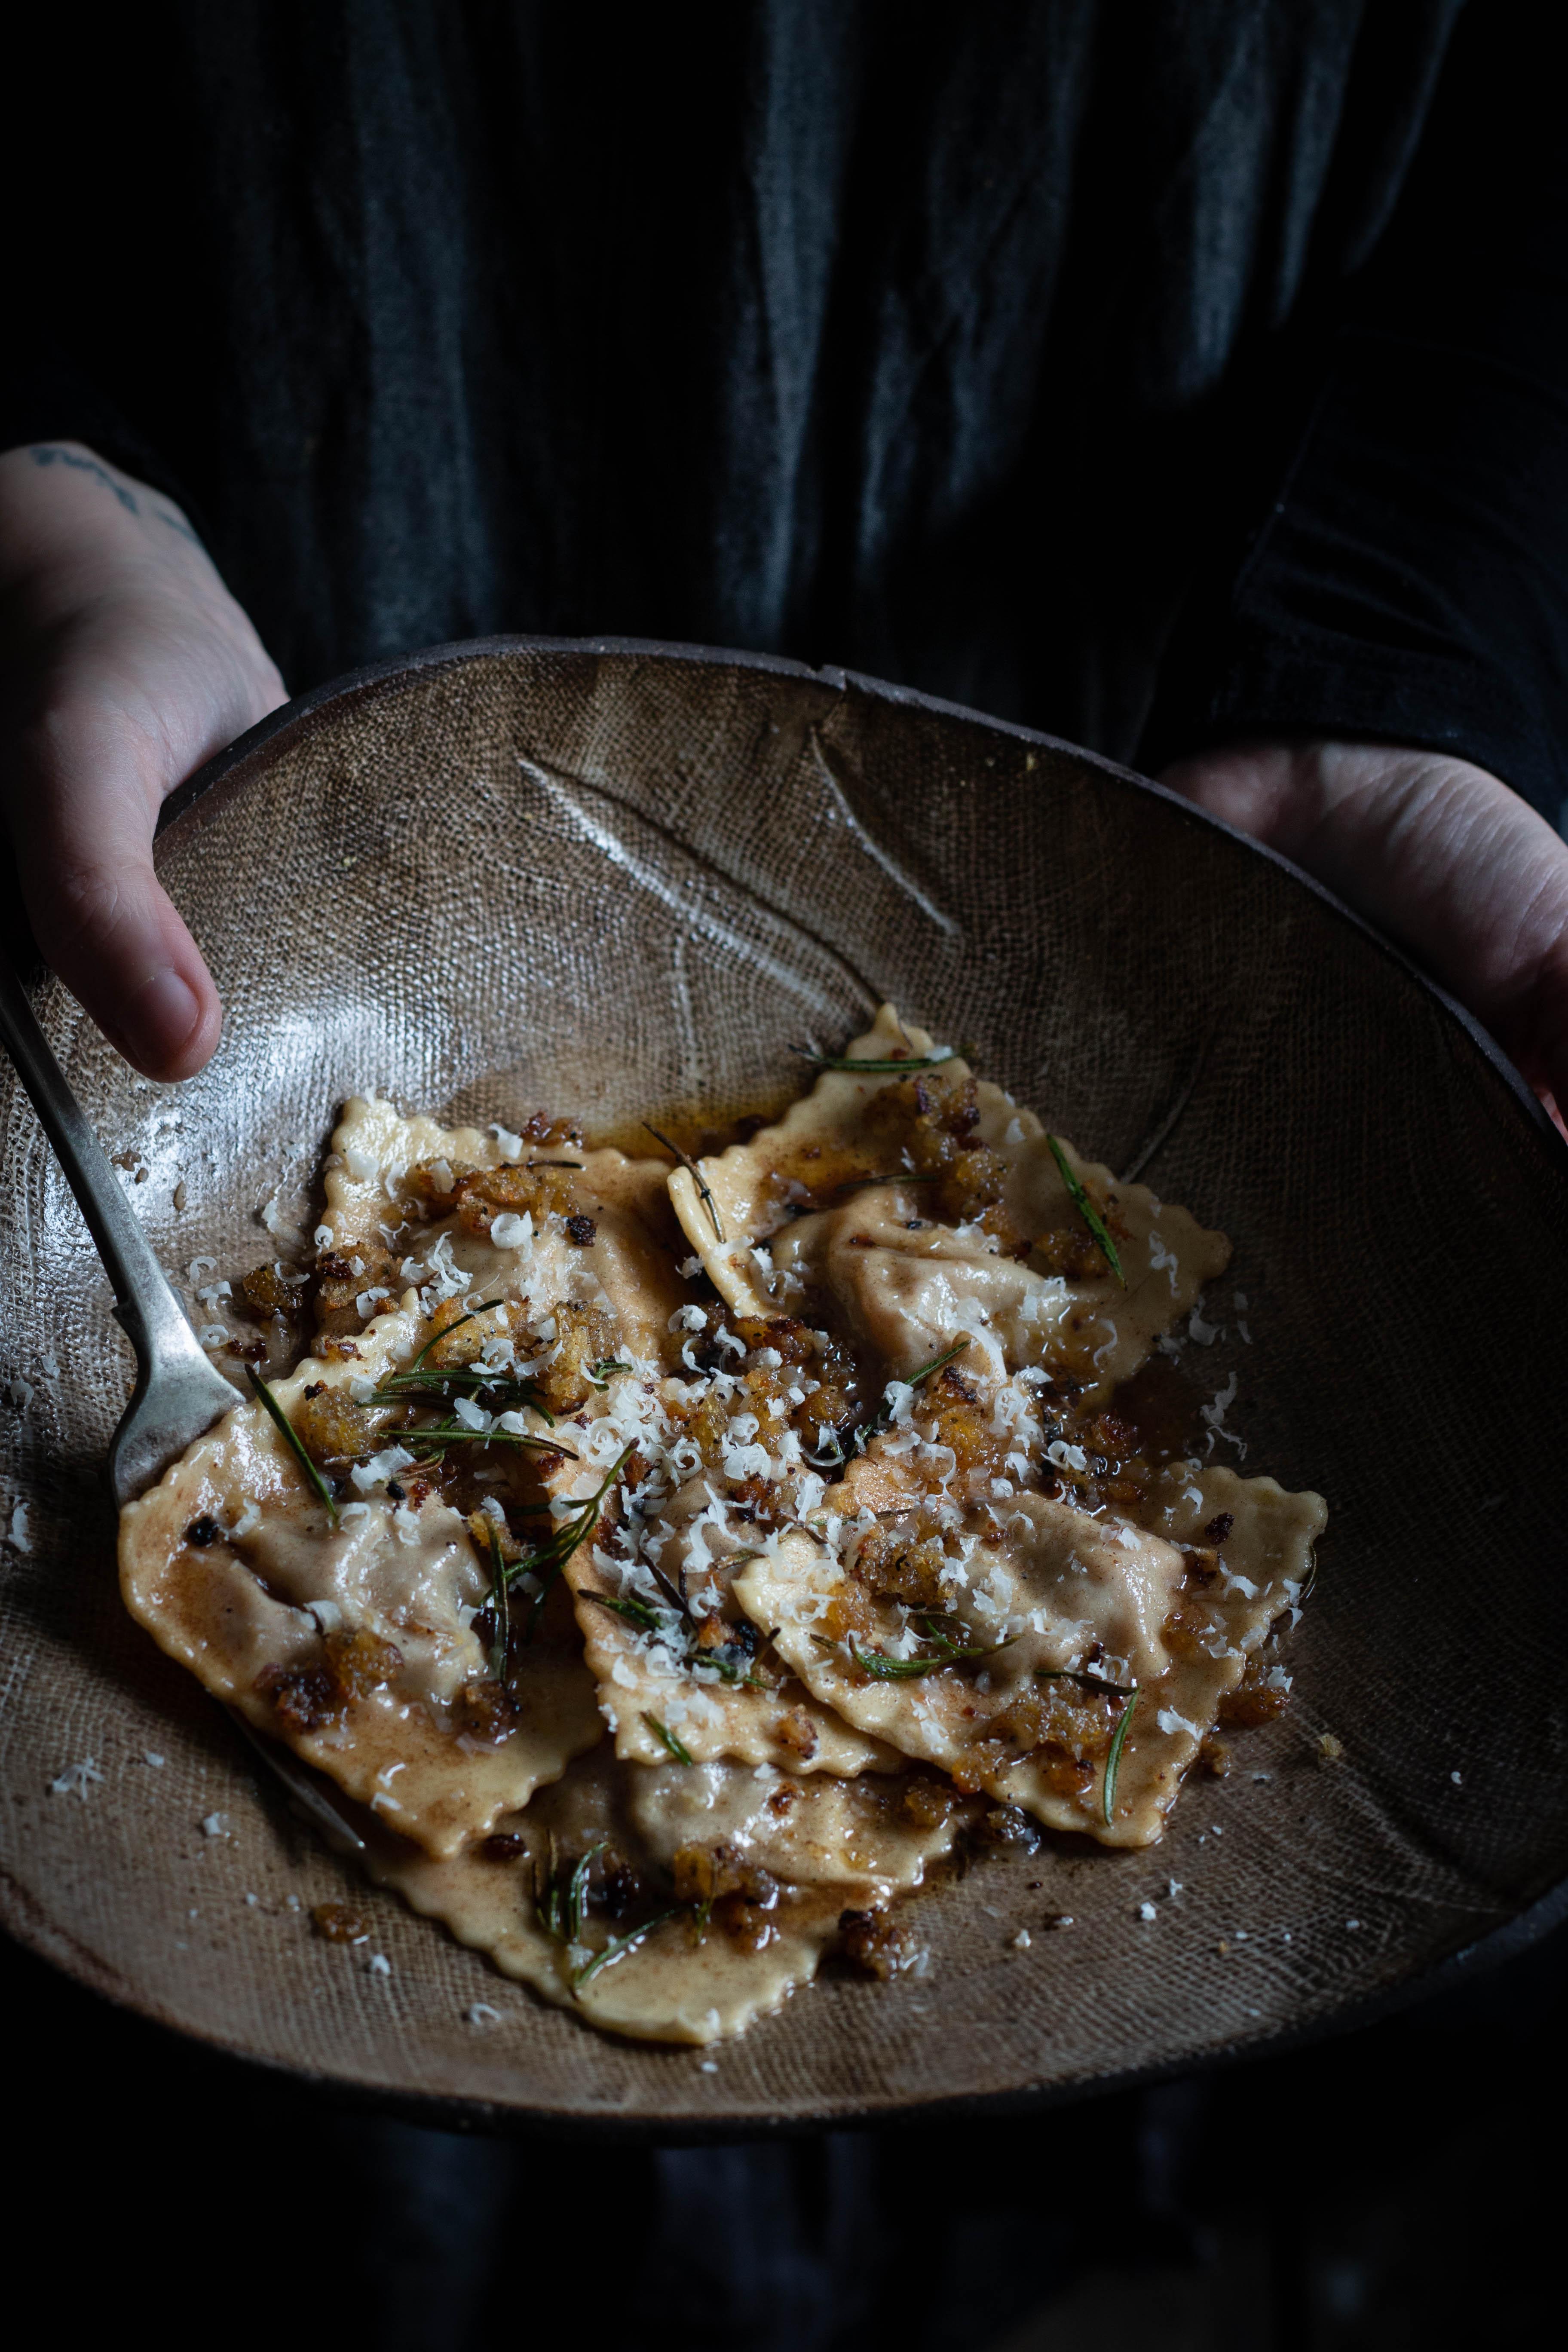 Braised lamb ravioli and wine pairing suggestions